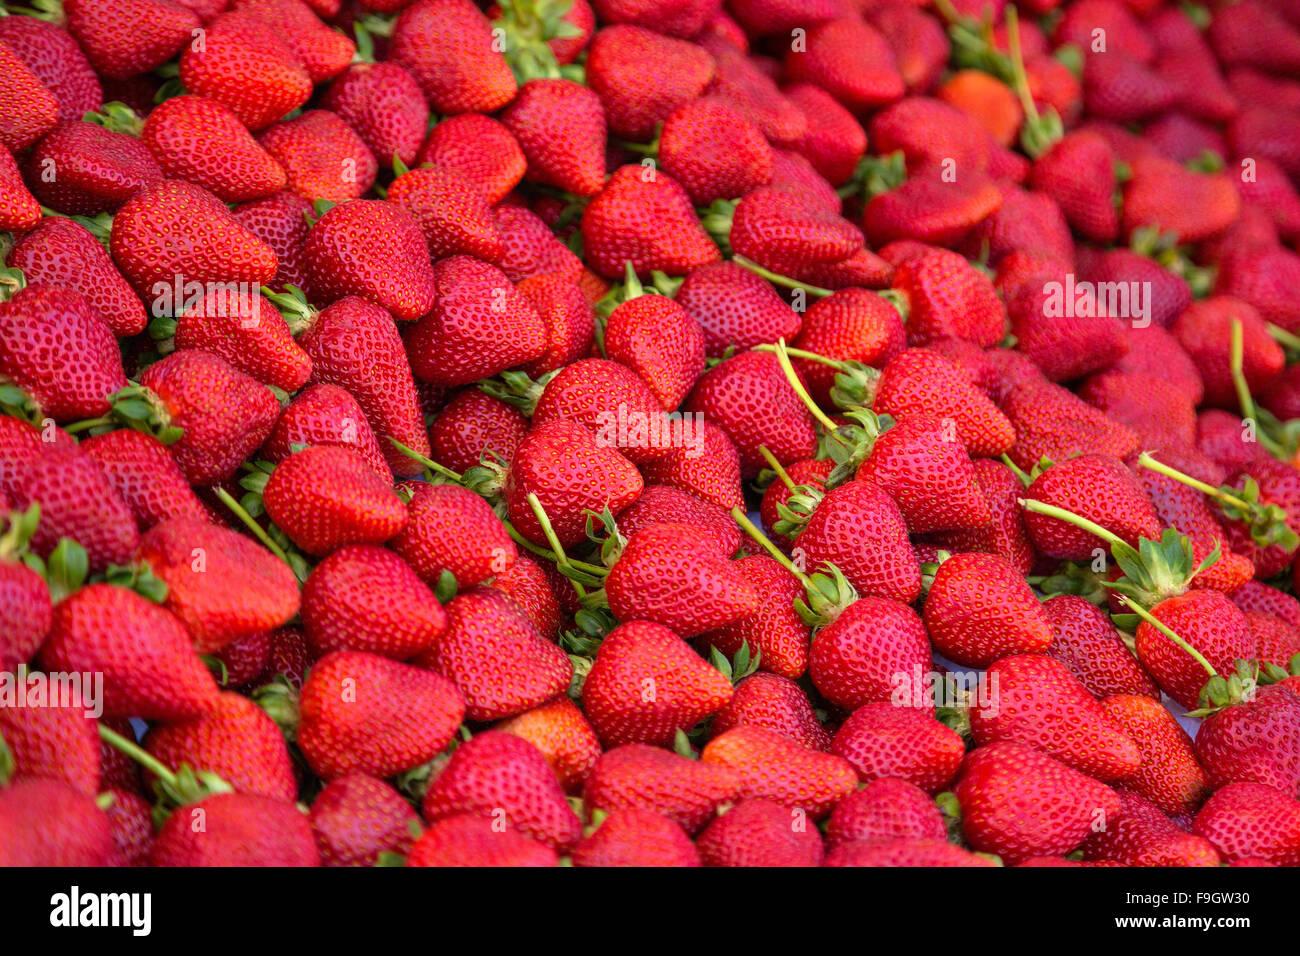 Organic strawberries on display - Stock Image